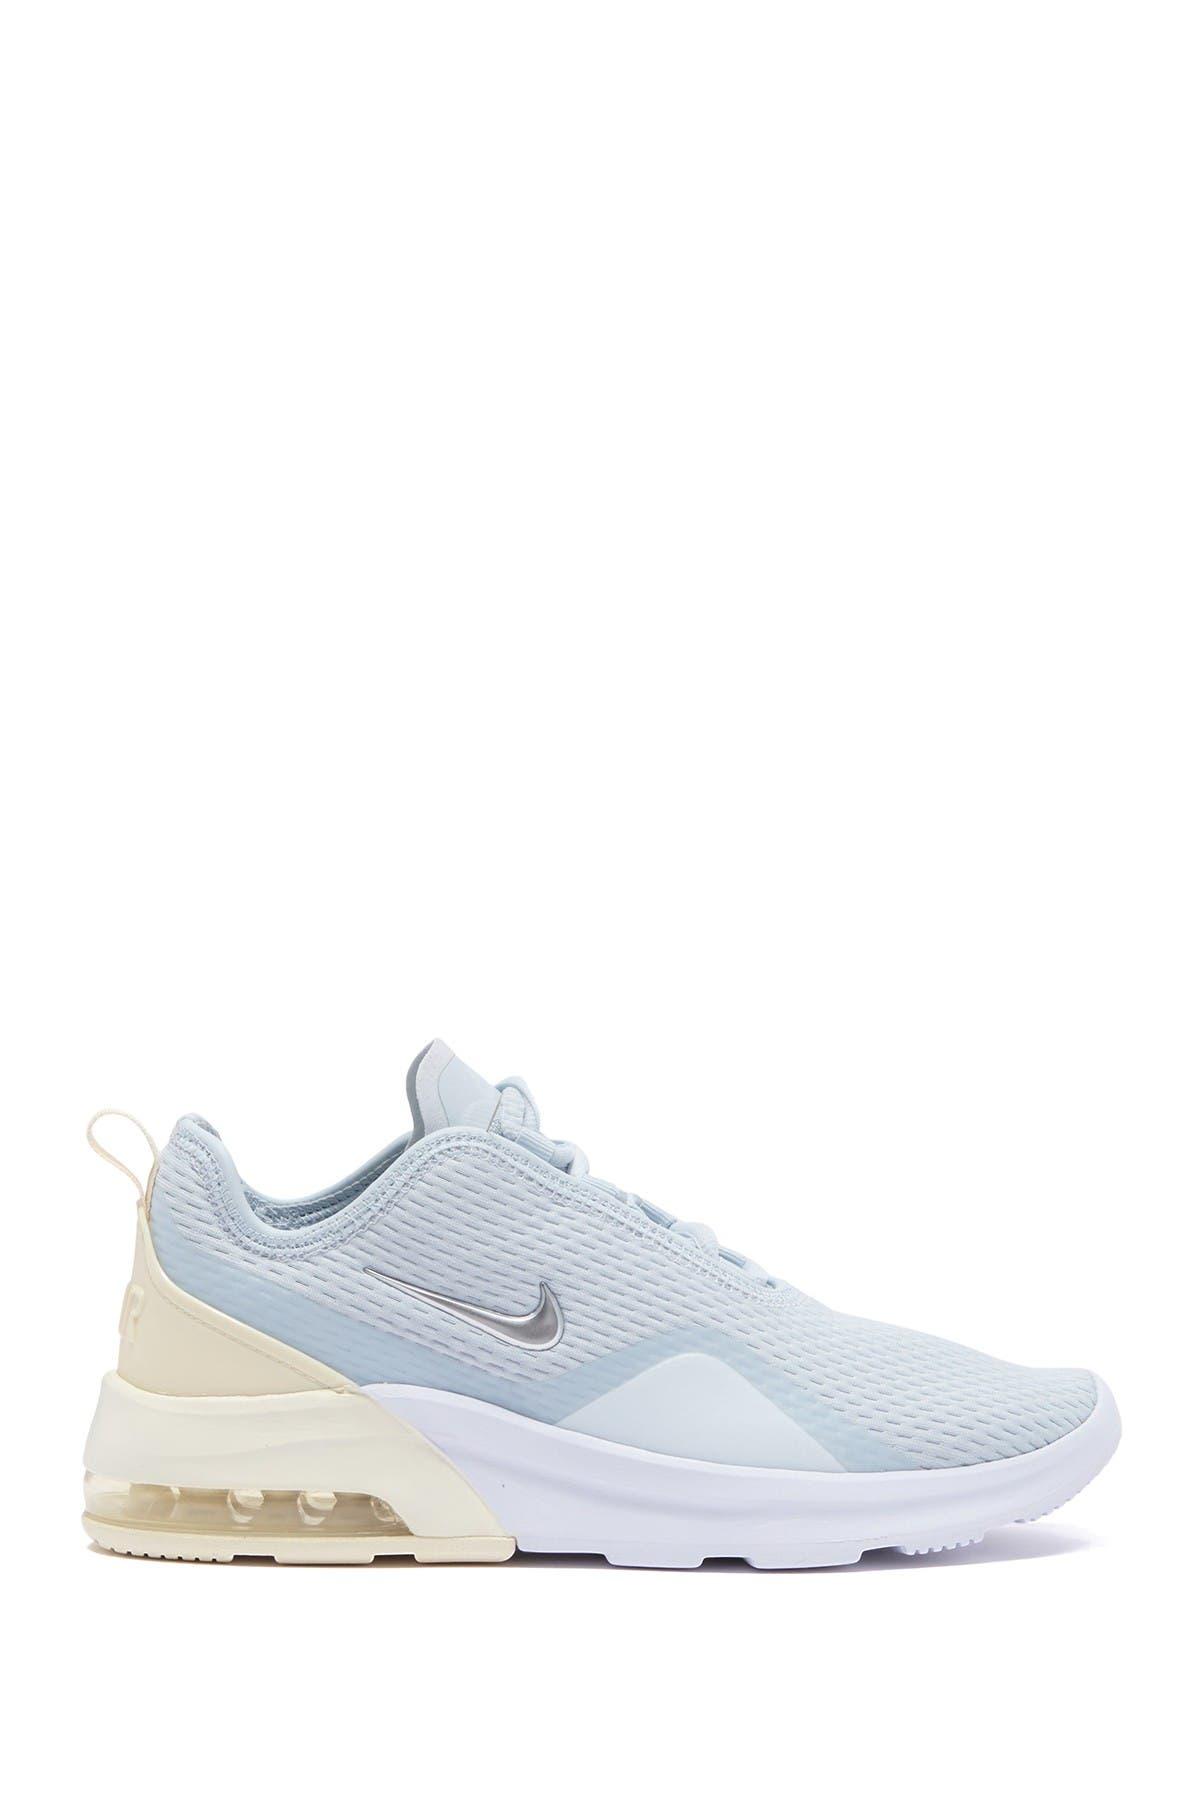 nike air max motion 2 women's sneakers